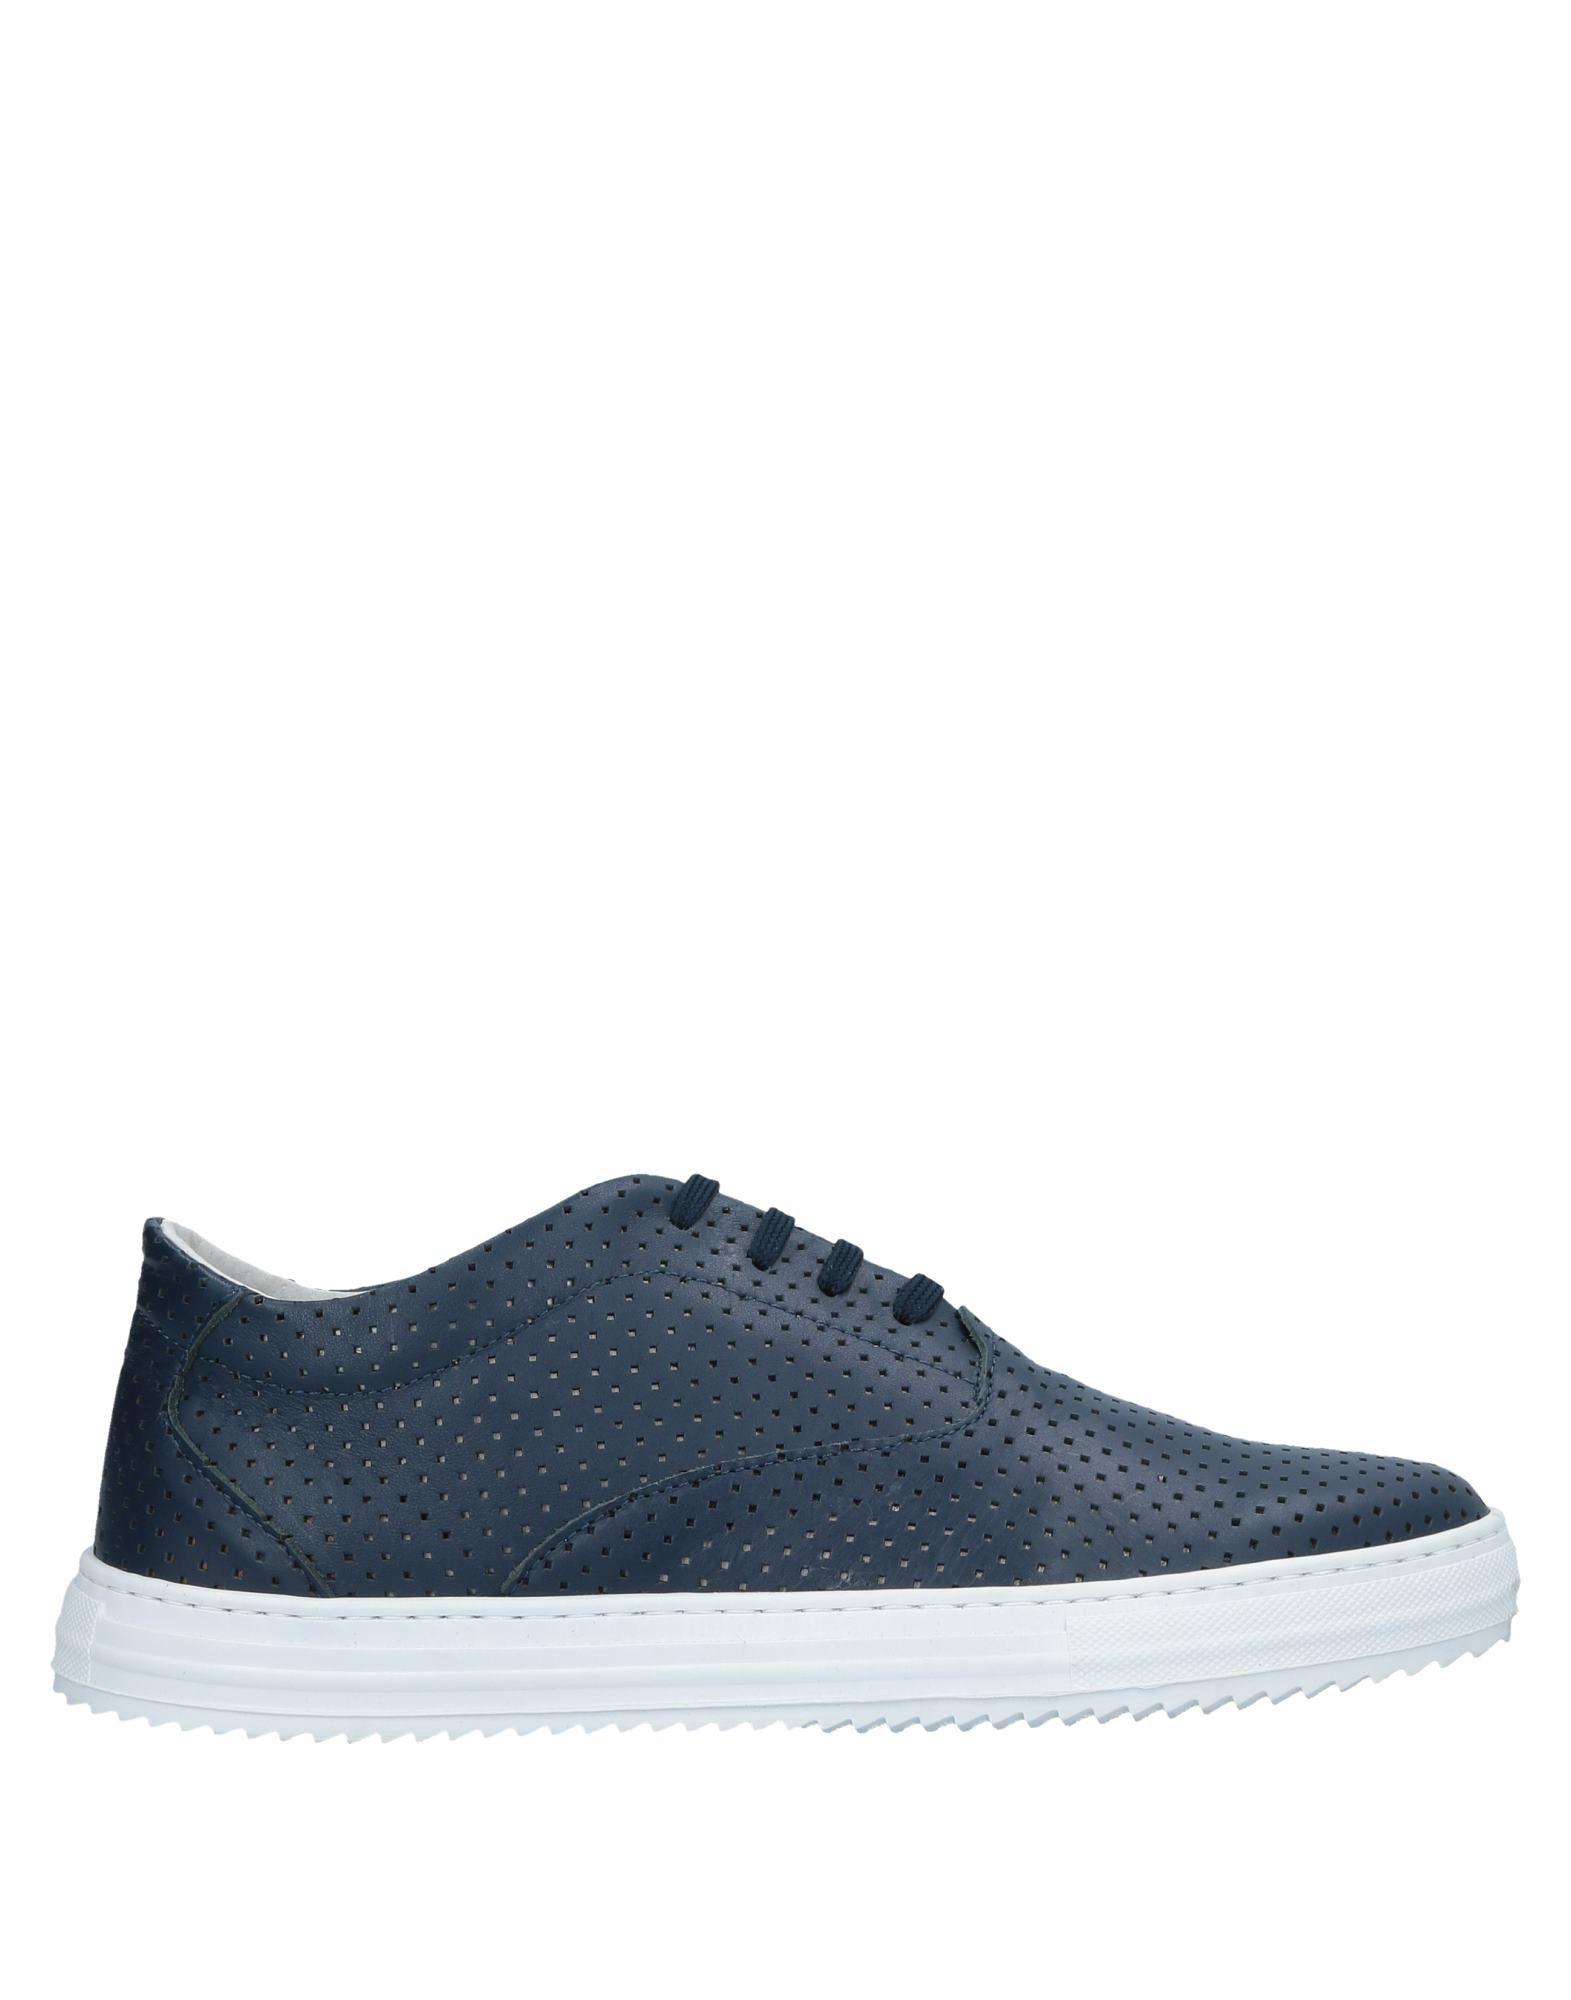 Sneakers Fratelli Circondato Uomo - 11521101JI